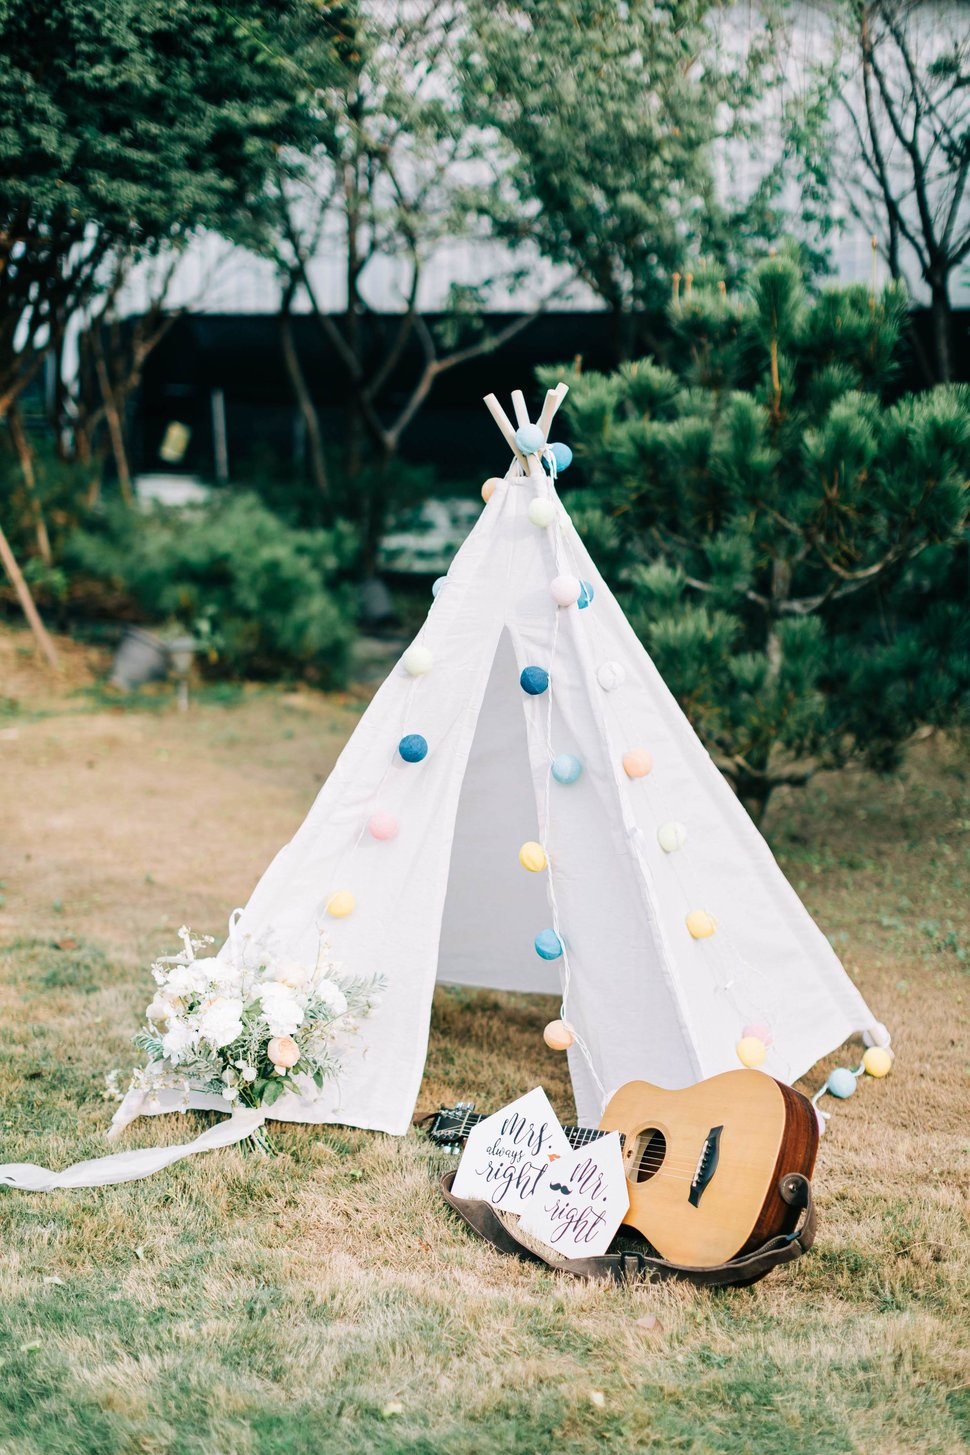 AG3_7108 - Cradle Wedding搖籃手工婚紗《結婚吧》